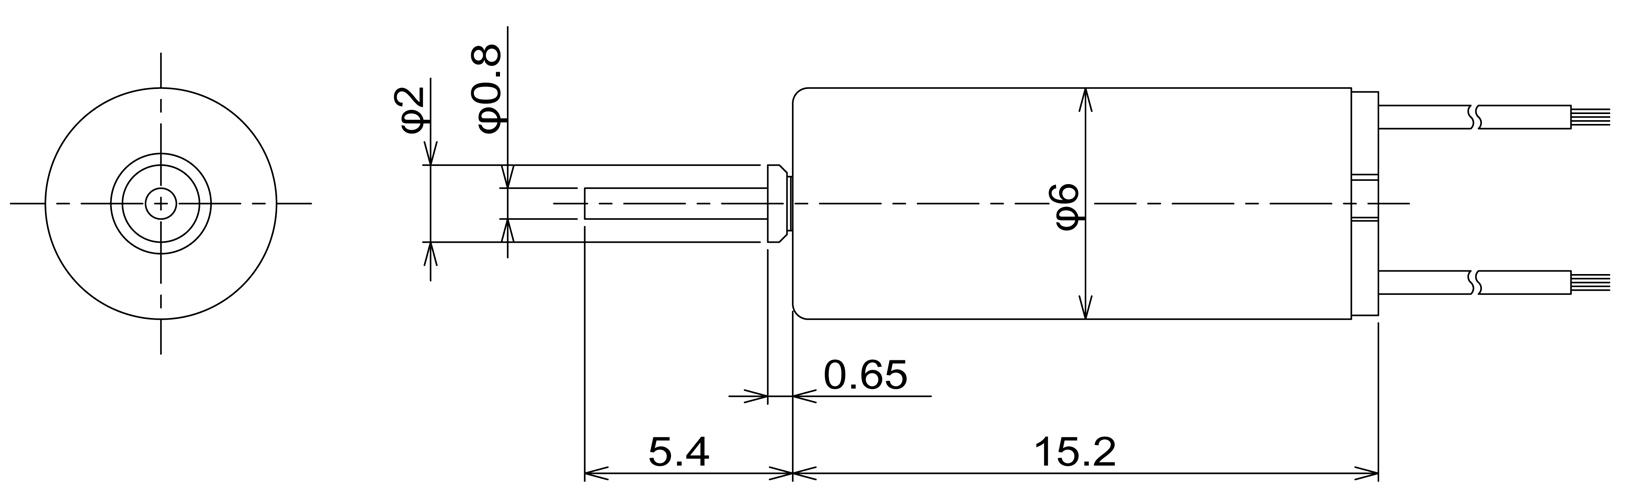 C.I. Takiron A6mm Motor CI.Takiron